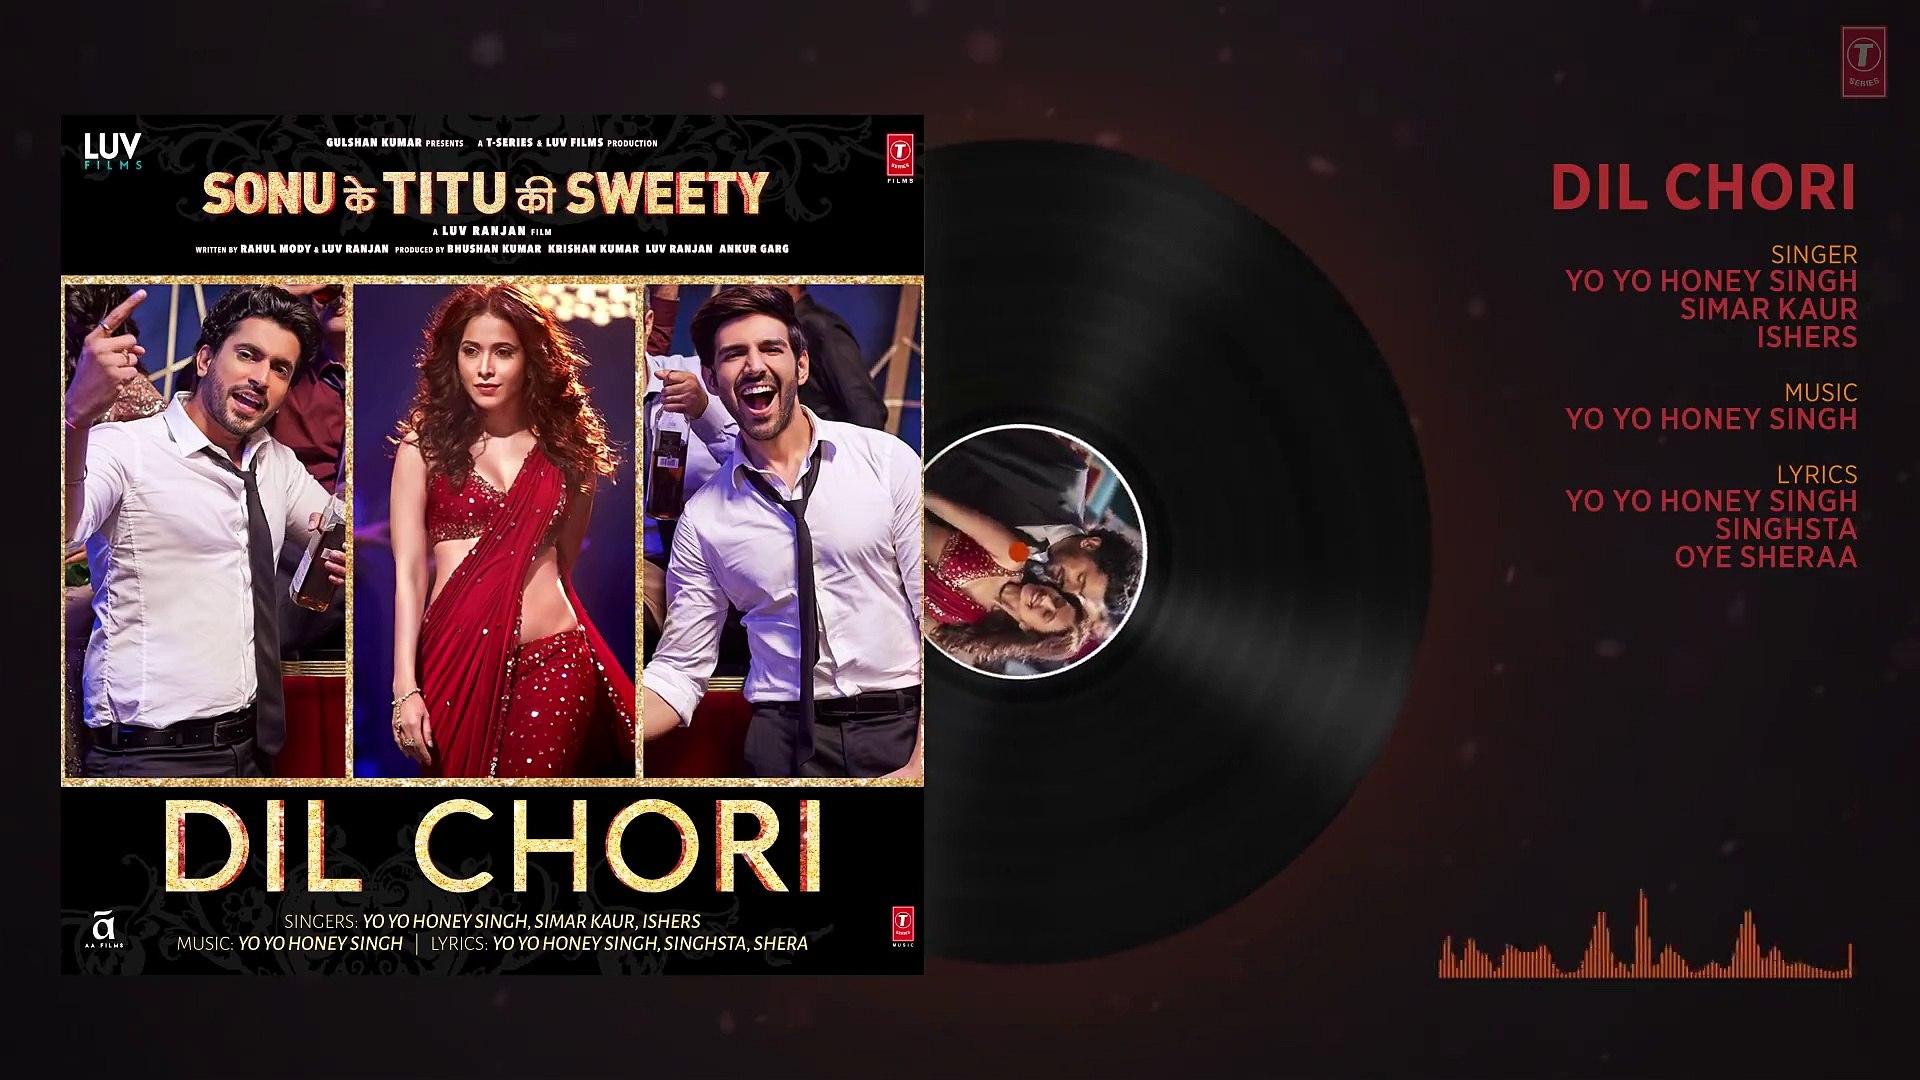 Yo Yo Honey Singh: DIL CHORI (Full Audio) Simar Kaur, Ishers | Hans Raj Hans |Sonu Ke Titu Ki Sweety